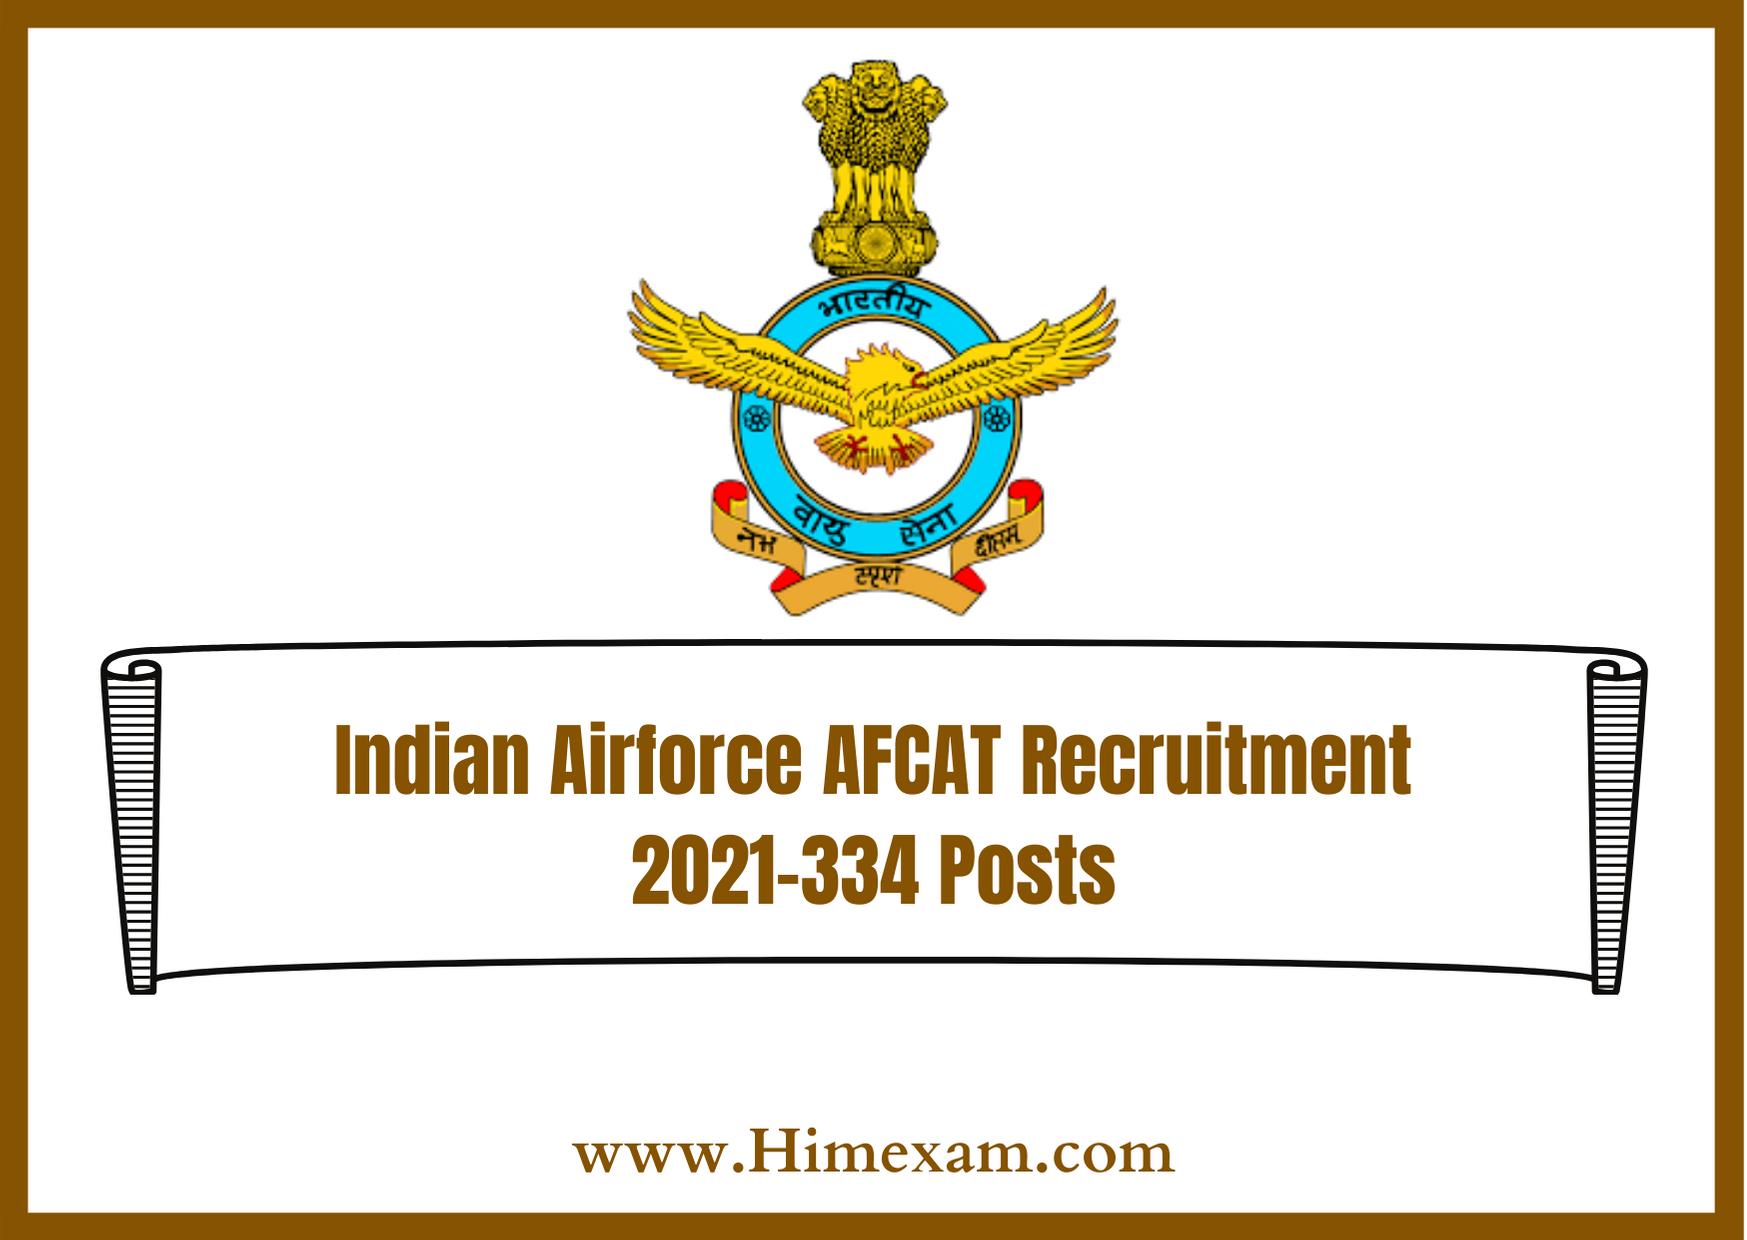 Indian Airforce AFCAT Recruitment 2021-334 Posts